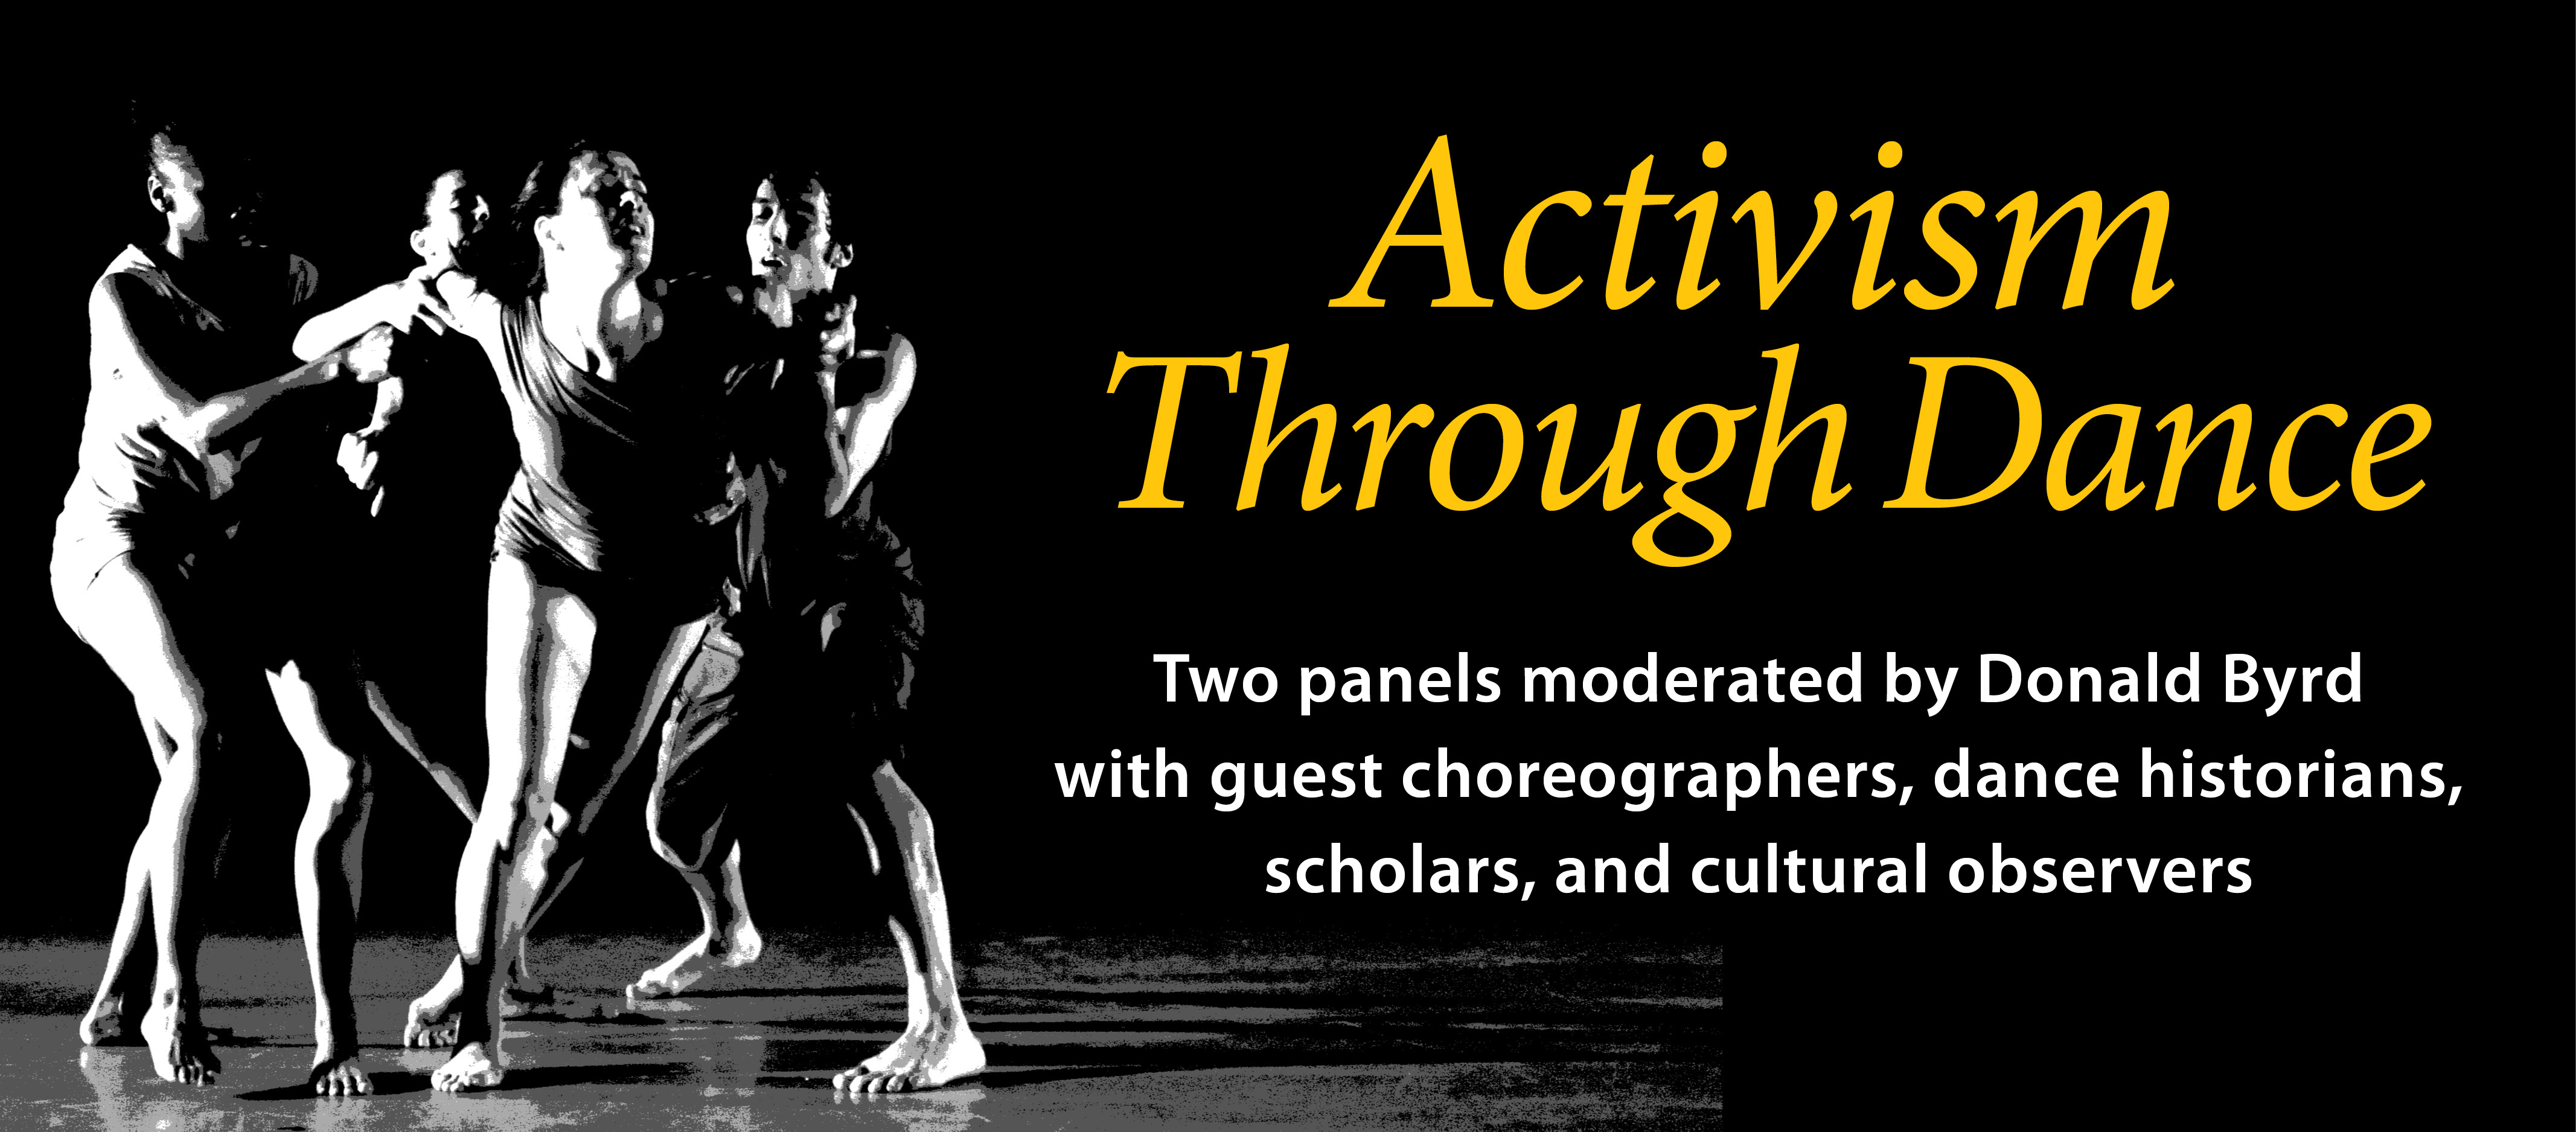 Activism Through Dance image